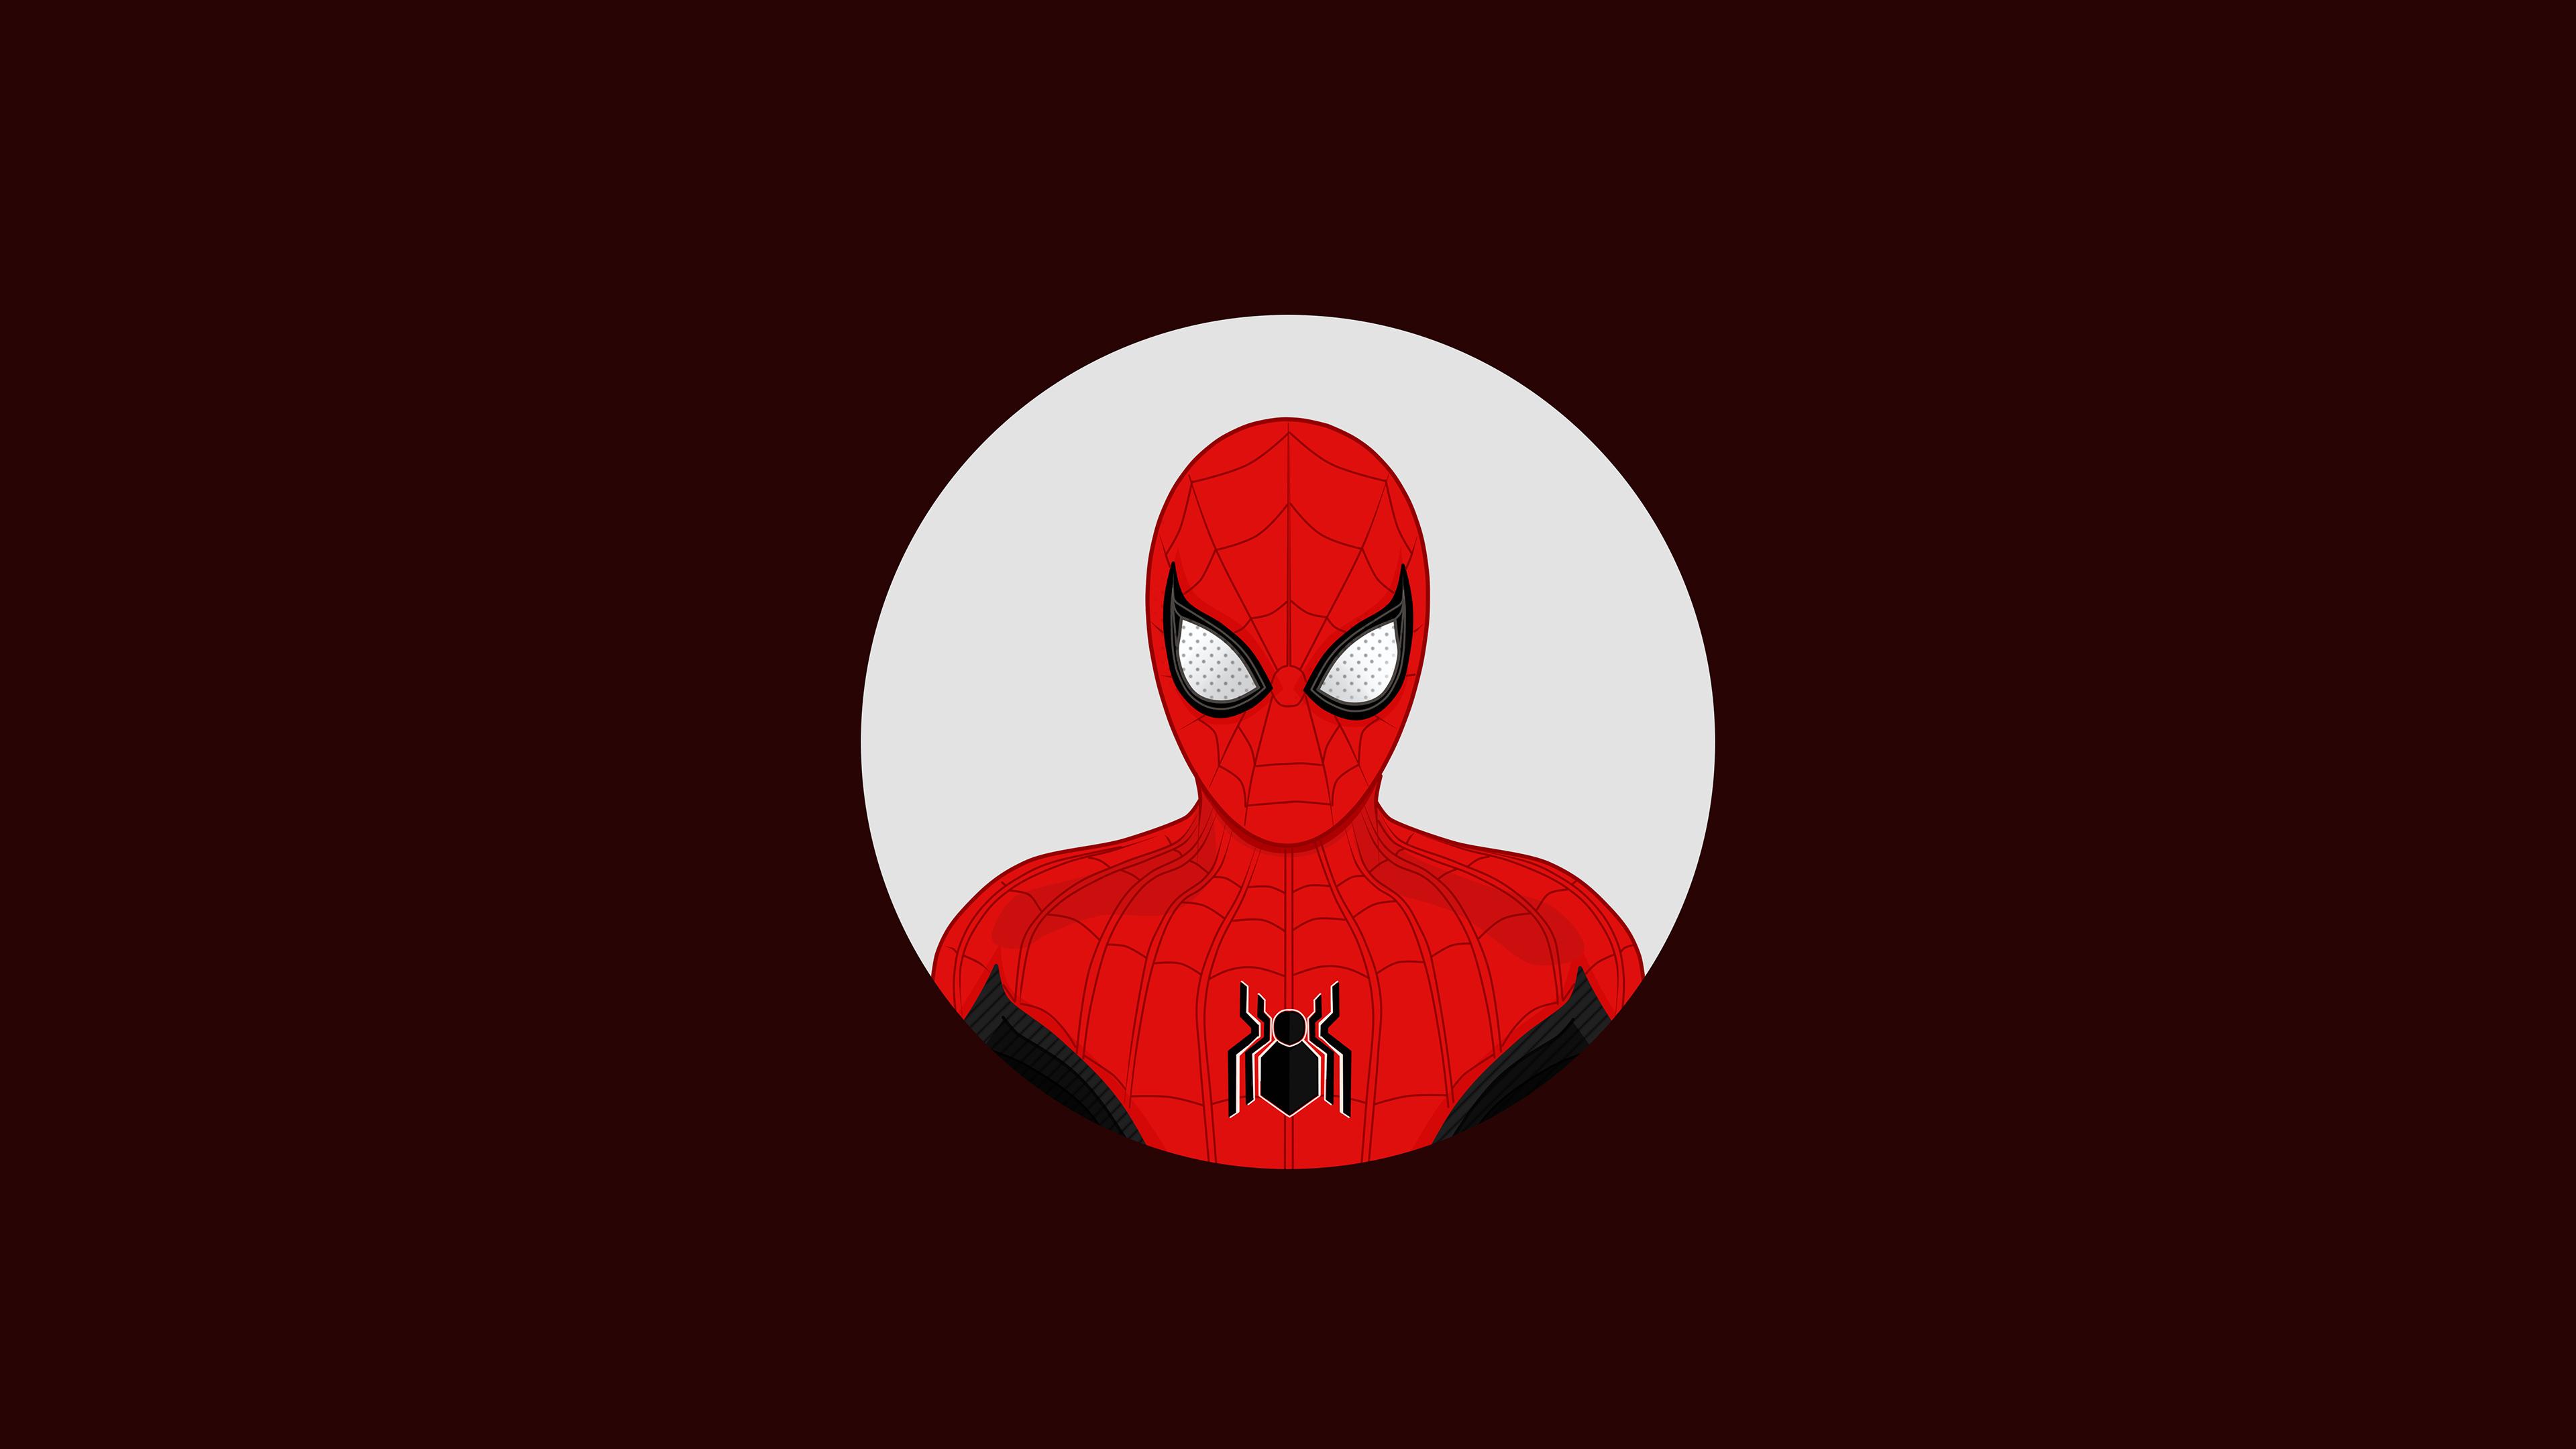 spiderman far from home minimal 1563219640 - Spiderman Far From Home Minimal - superheroes wallpapers, spiderman wallpapers, hd-wallpapers, behance wallpapers, artwork wallpapers, 4k-wallpapers